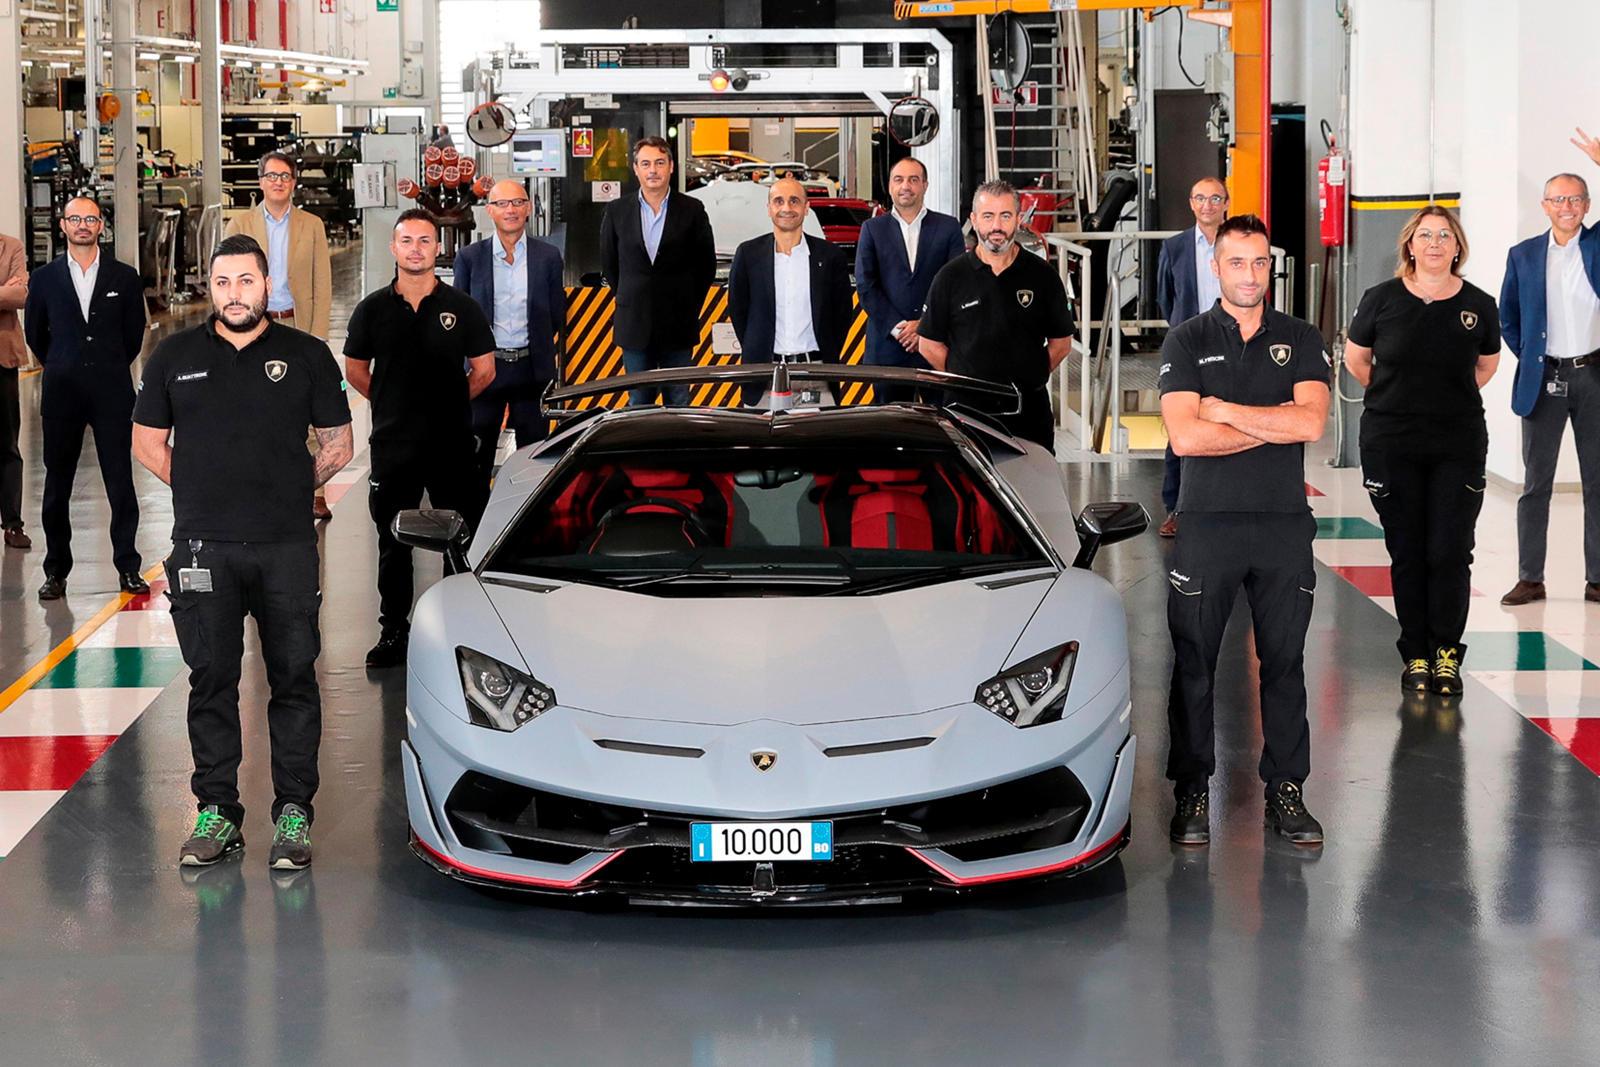 90025 The Lamborghini Aventador Just Set A New Record